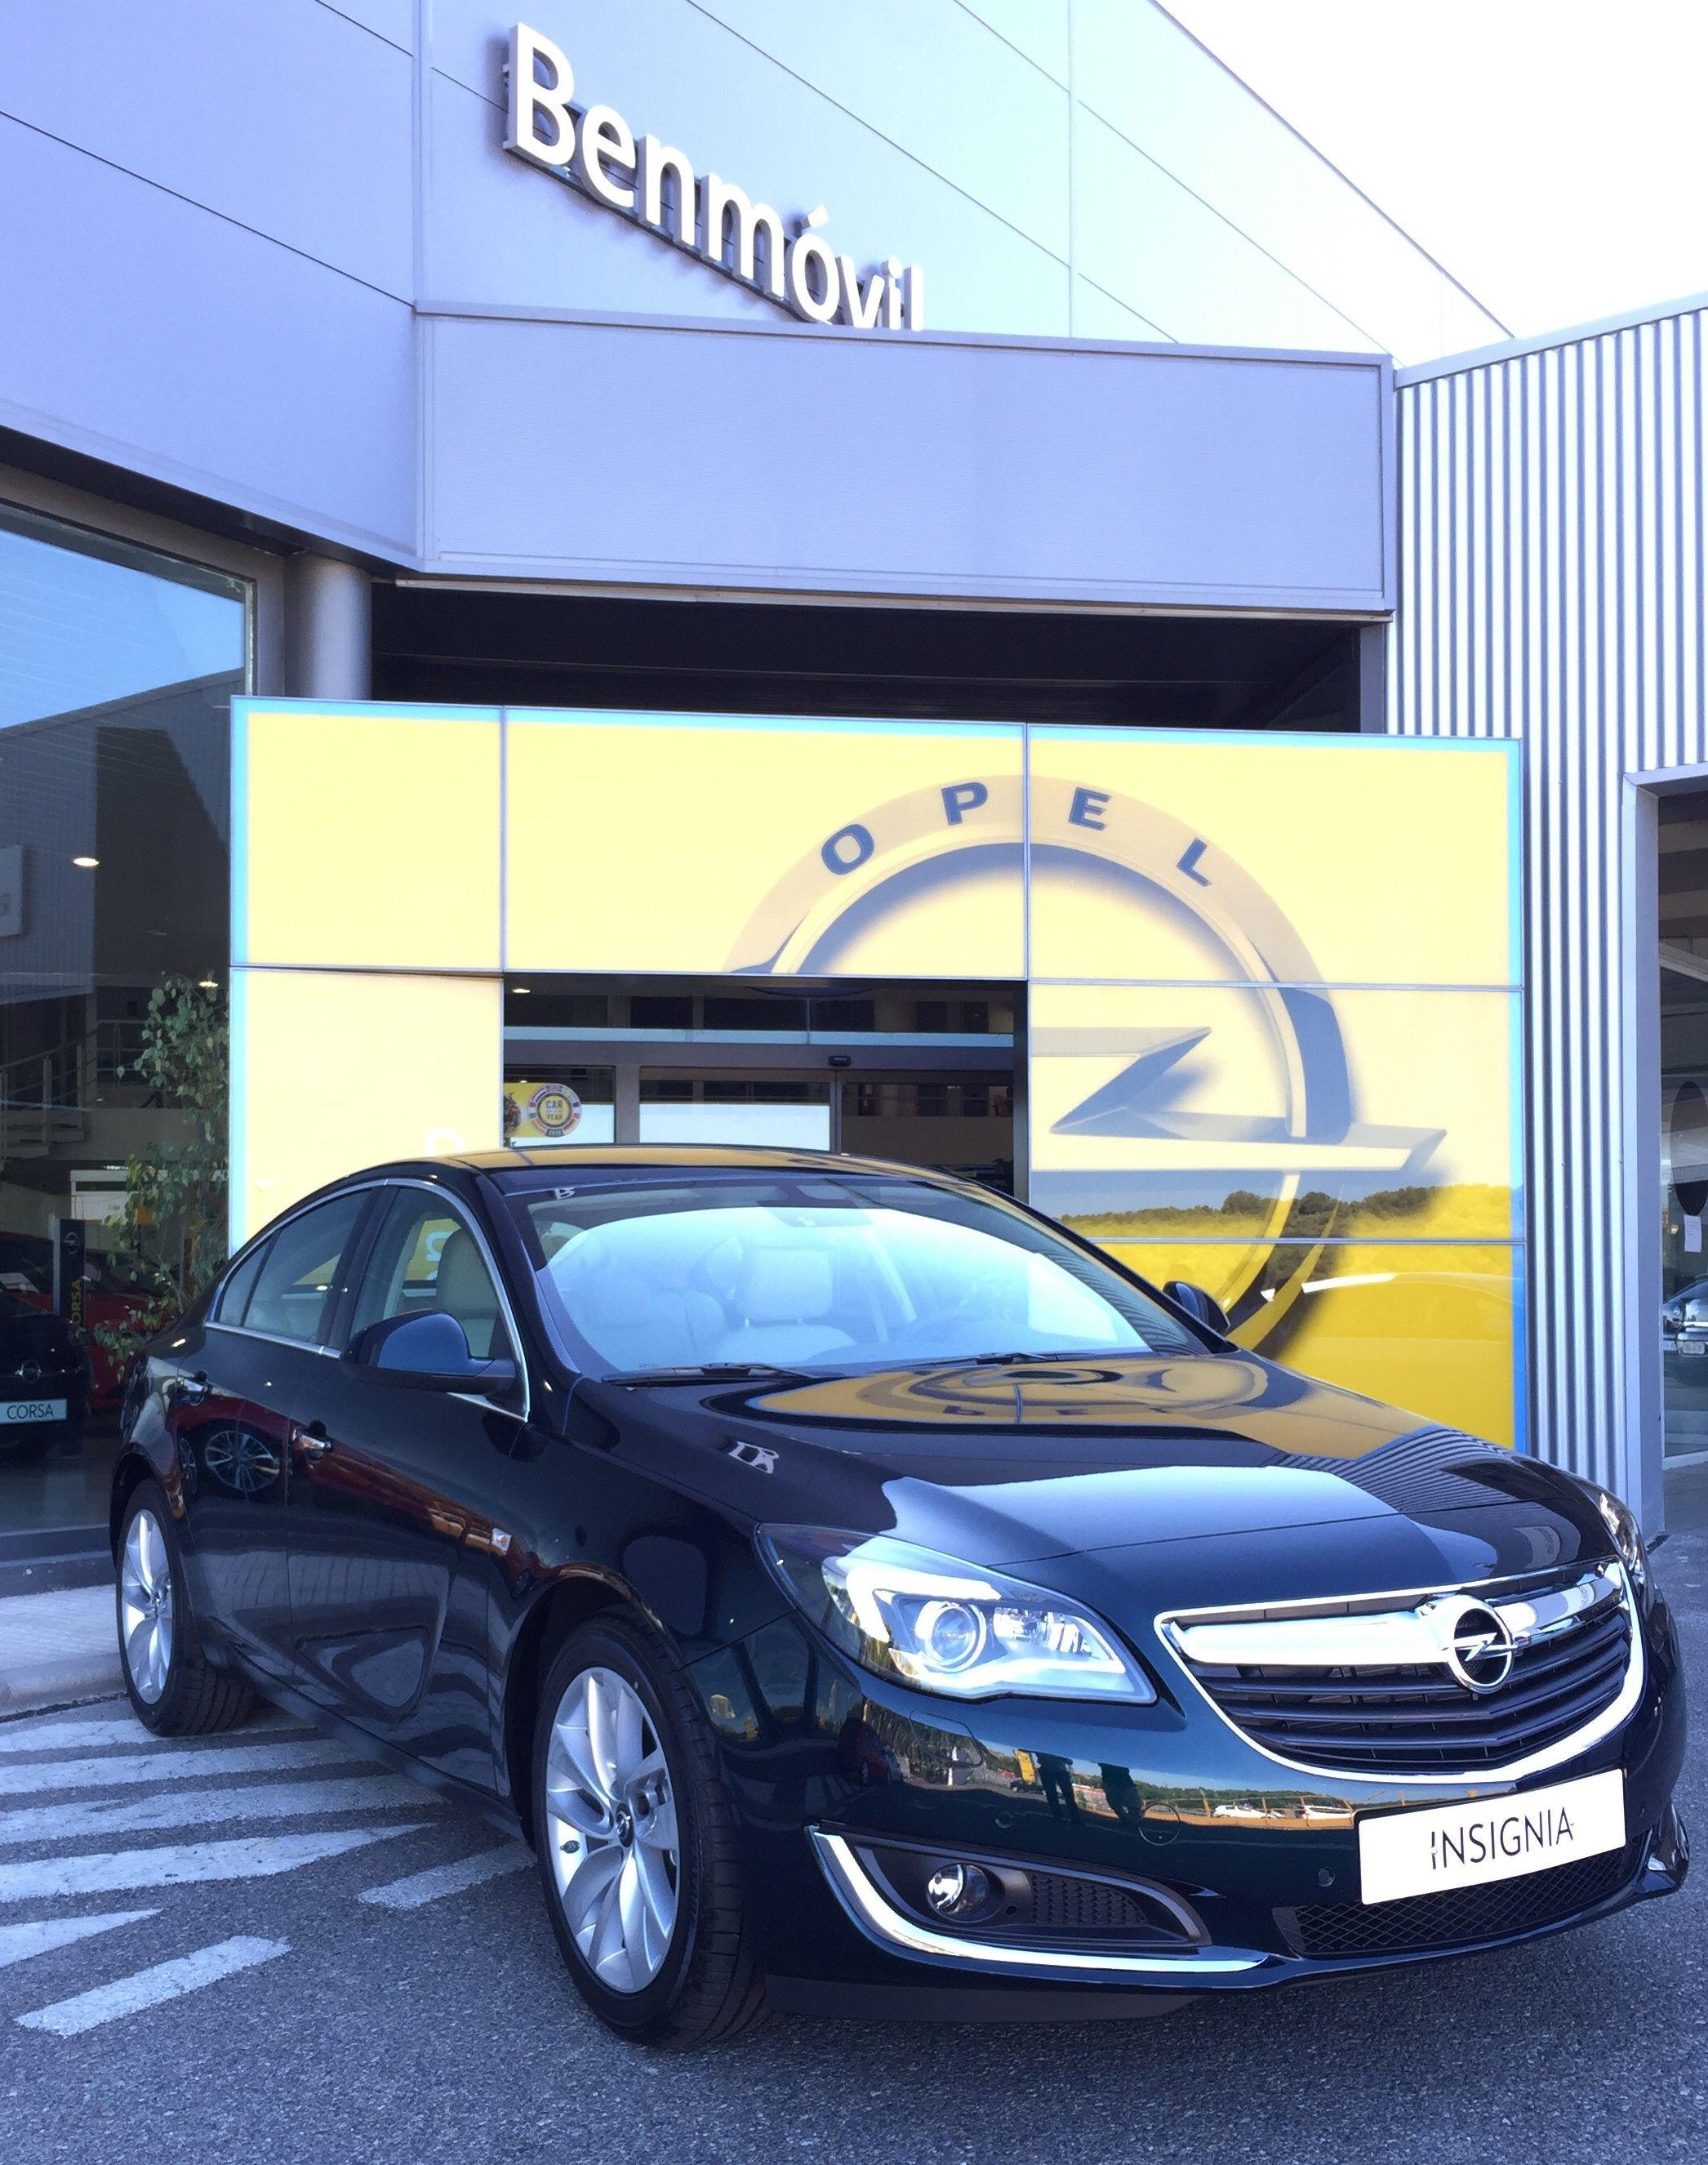 Se busca piloto elegante para conducir Opel Insignia Excellence . Exito asegurado por sólo 210€ al mes